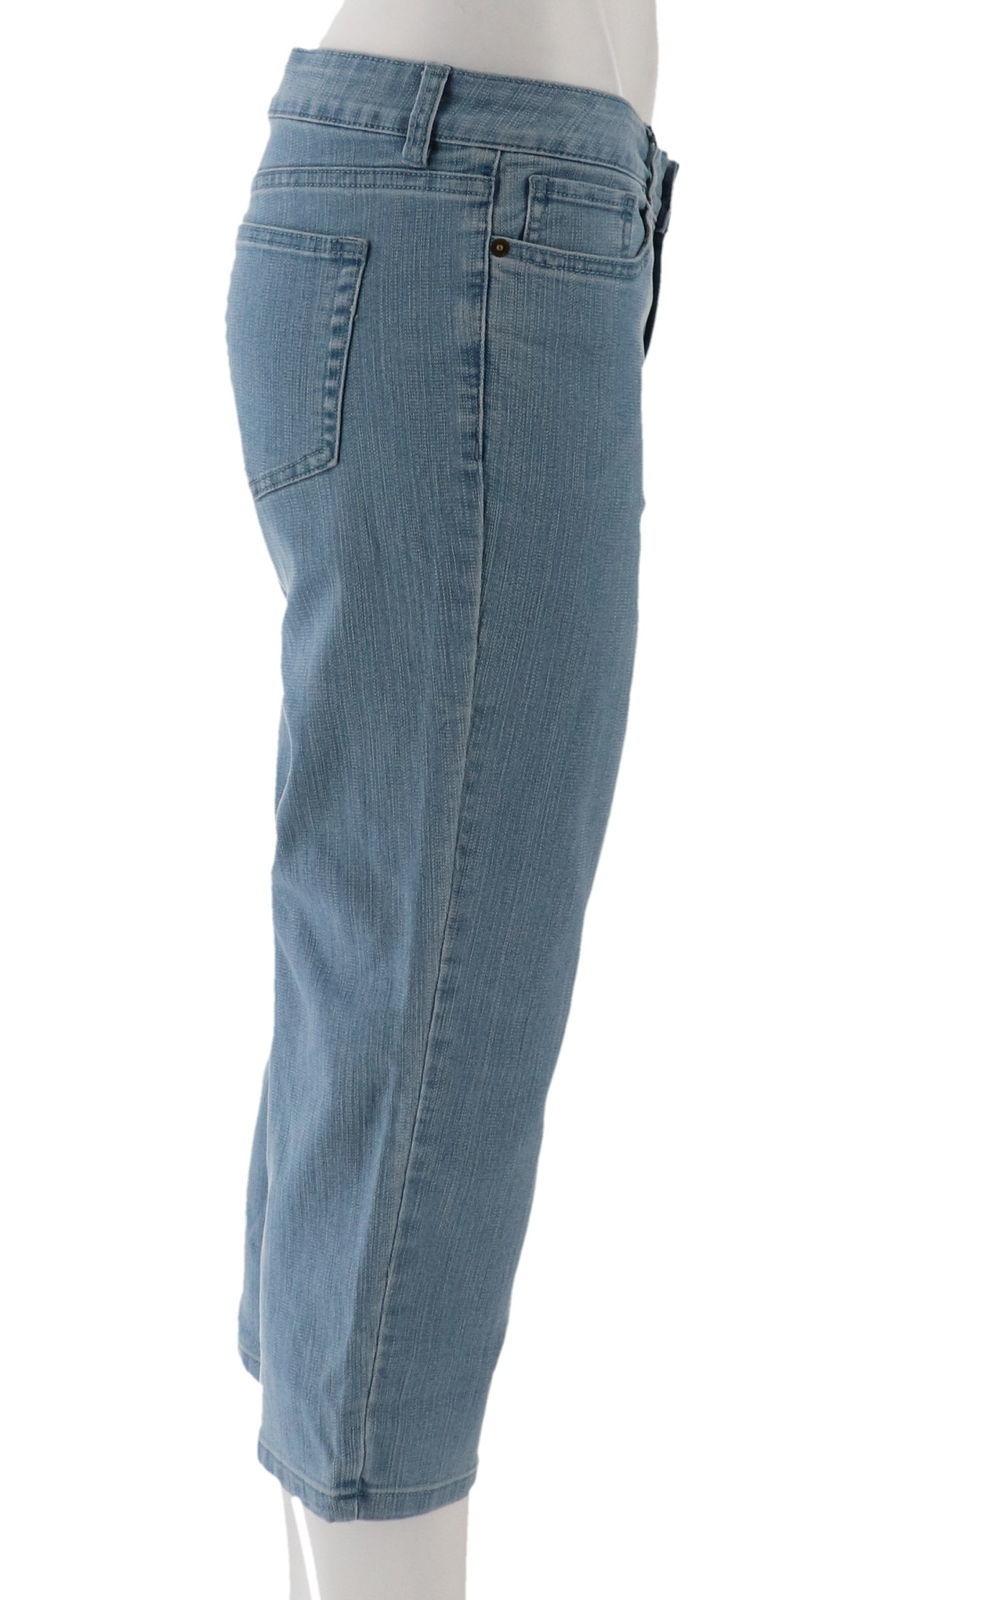 Denim& Co Petite Perfect Denim Crop Length Jeans Bleach Wash 22P NEW A301741